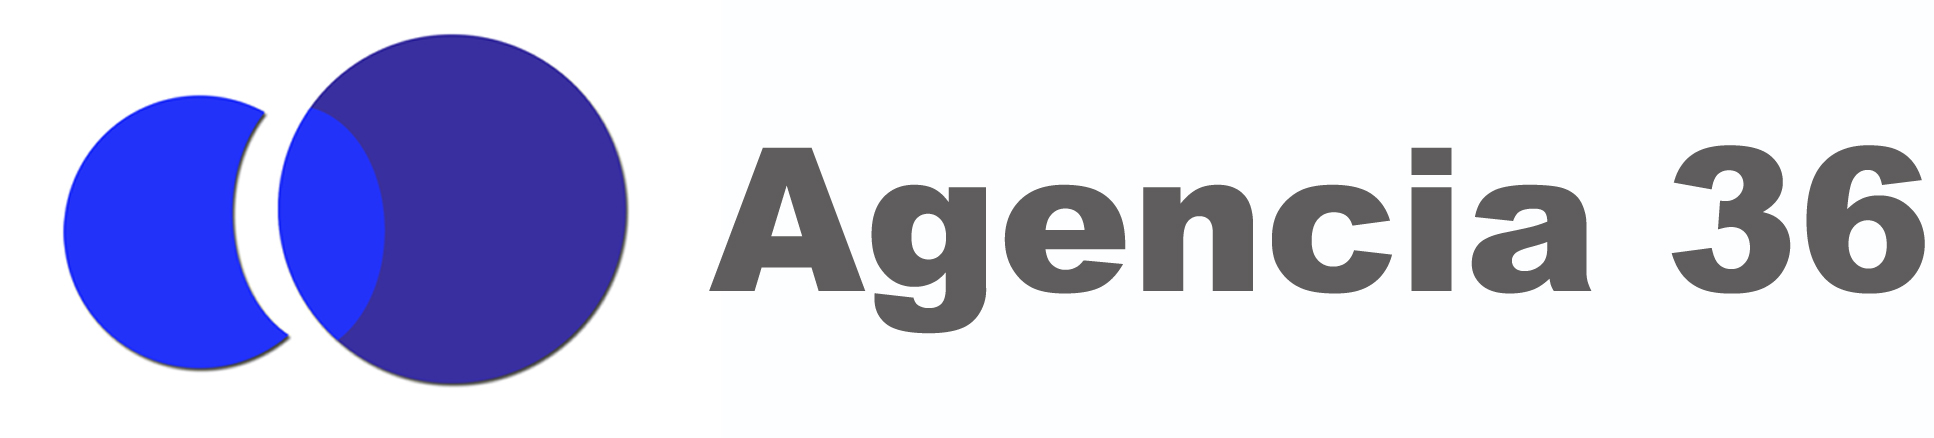 Agencia 36